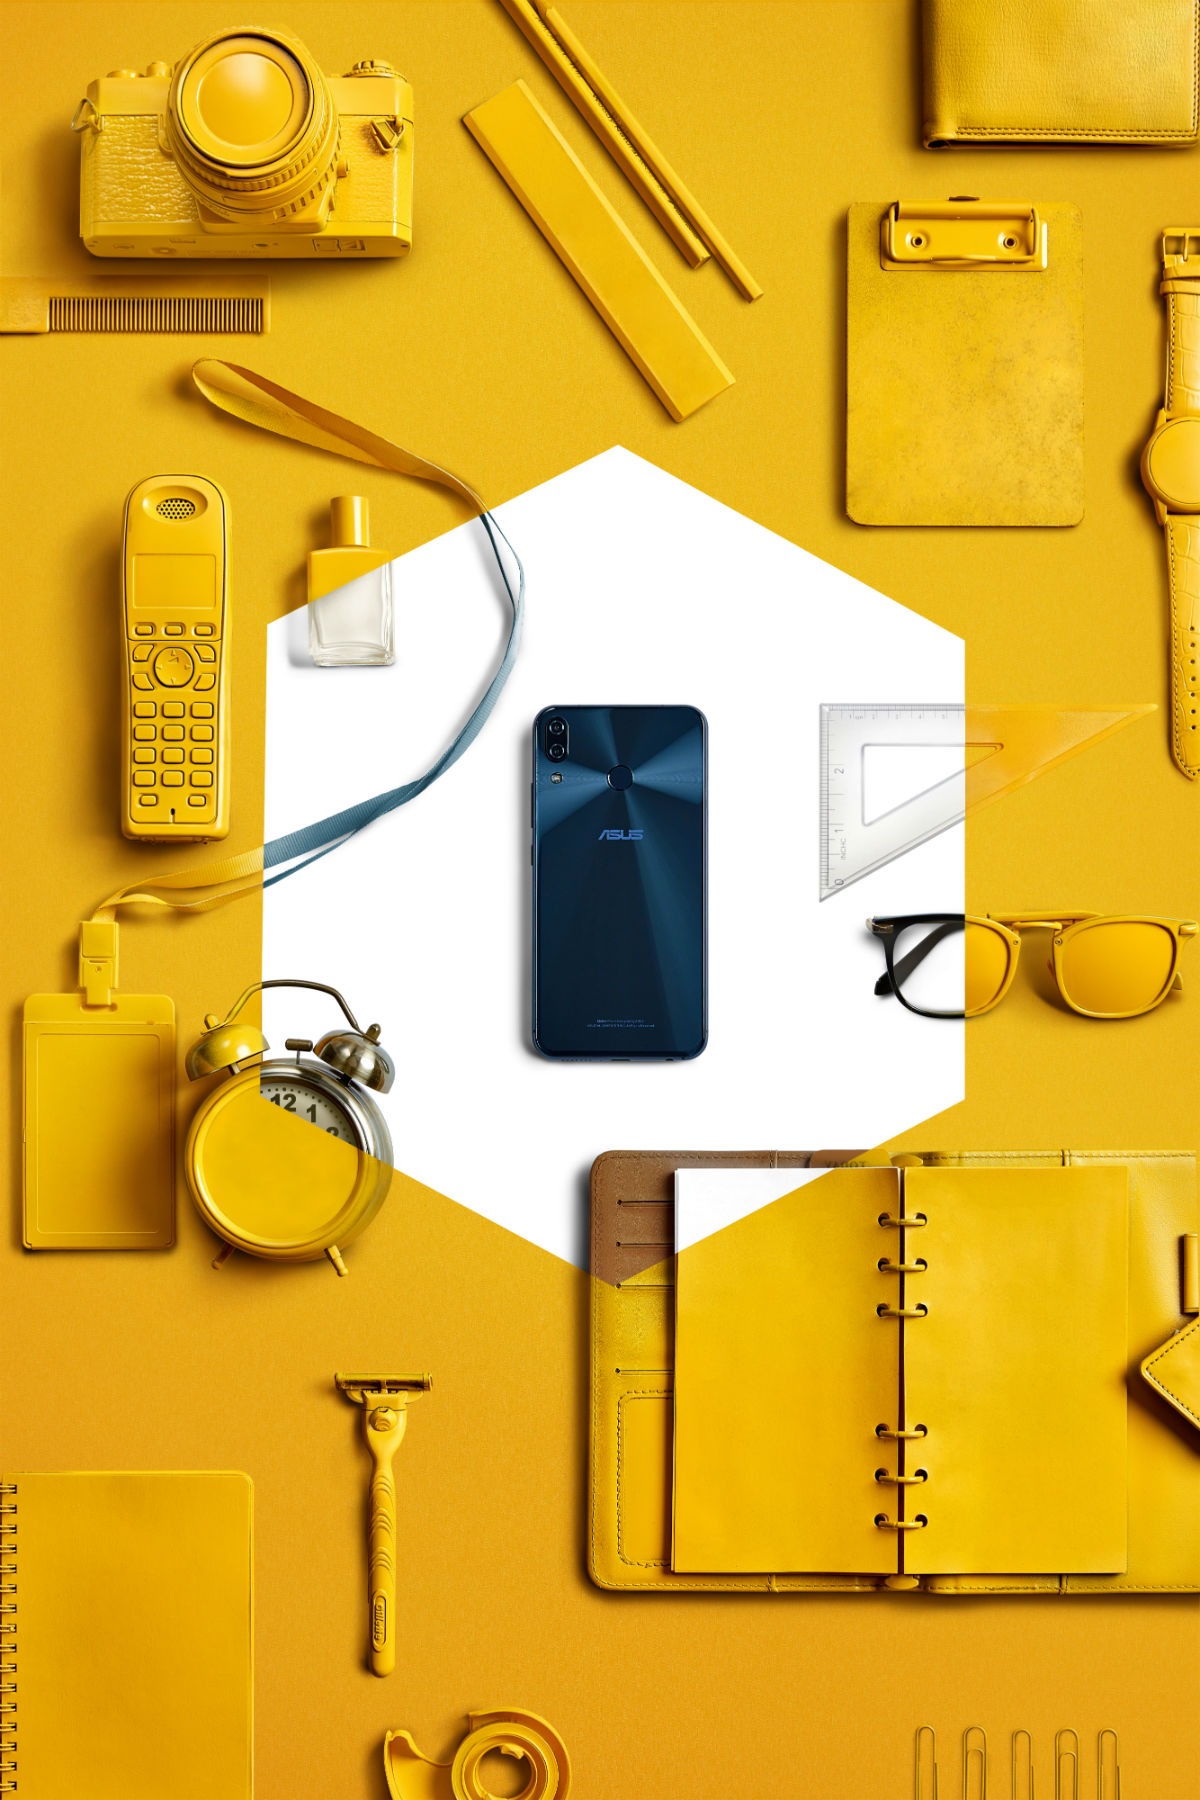 Asus Zenfone 5Z - Foto stampa